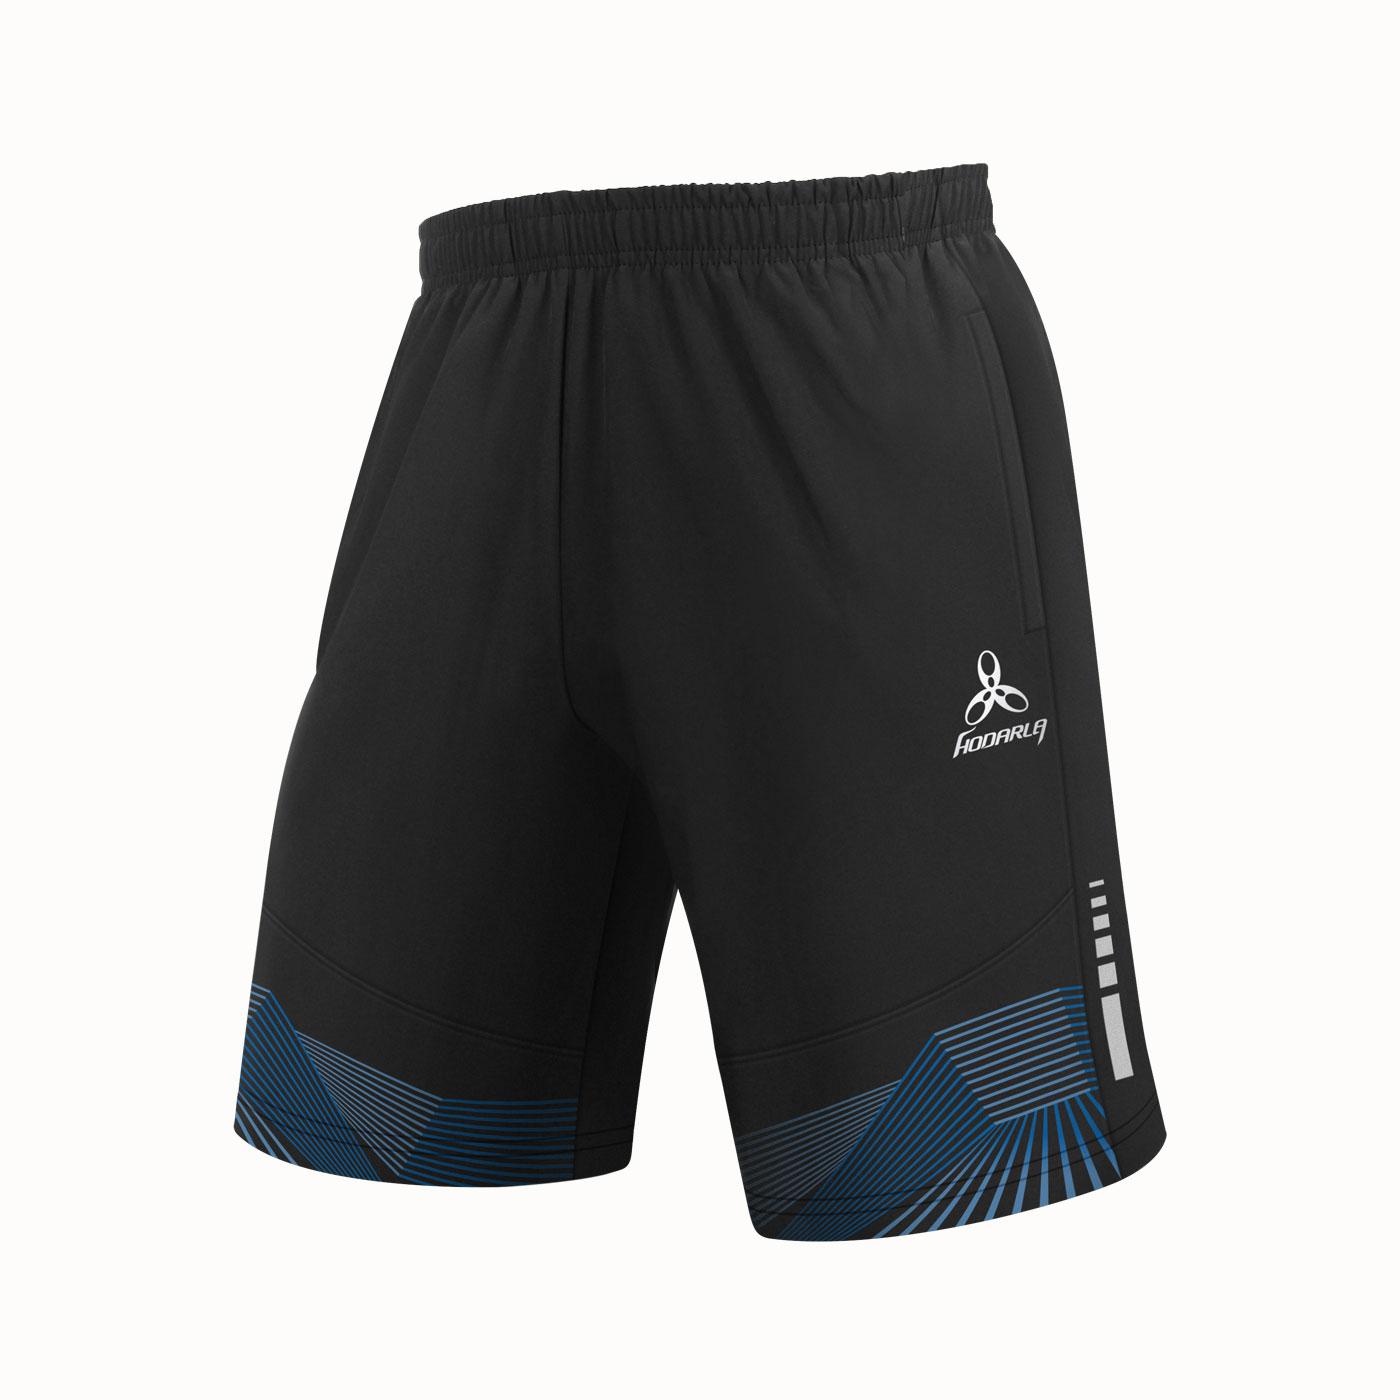 HODARLA 星光針織運動短褲 3306401 - 黑亮藍